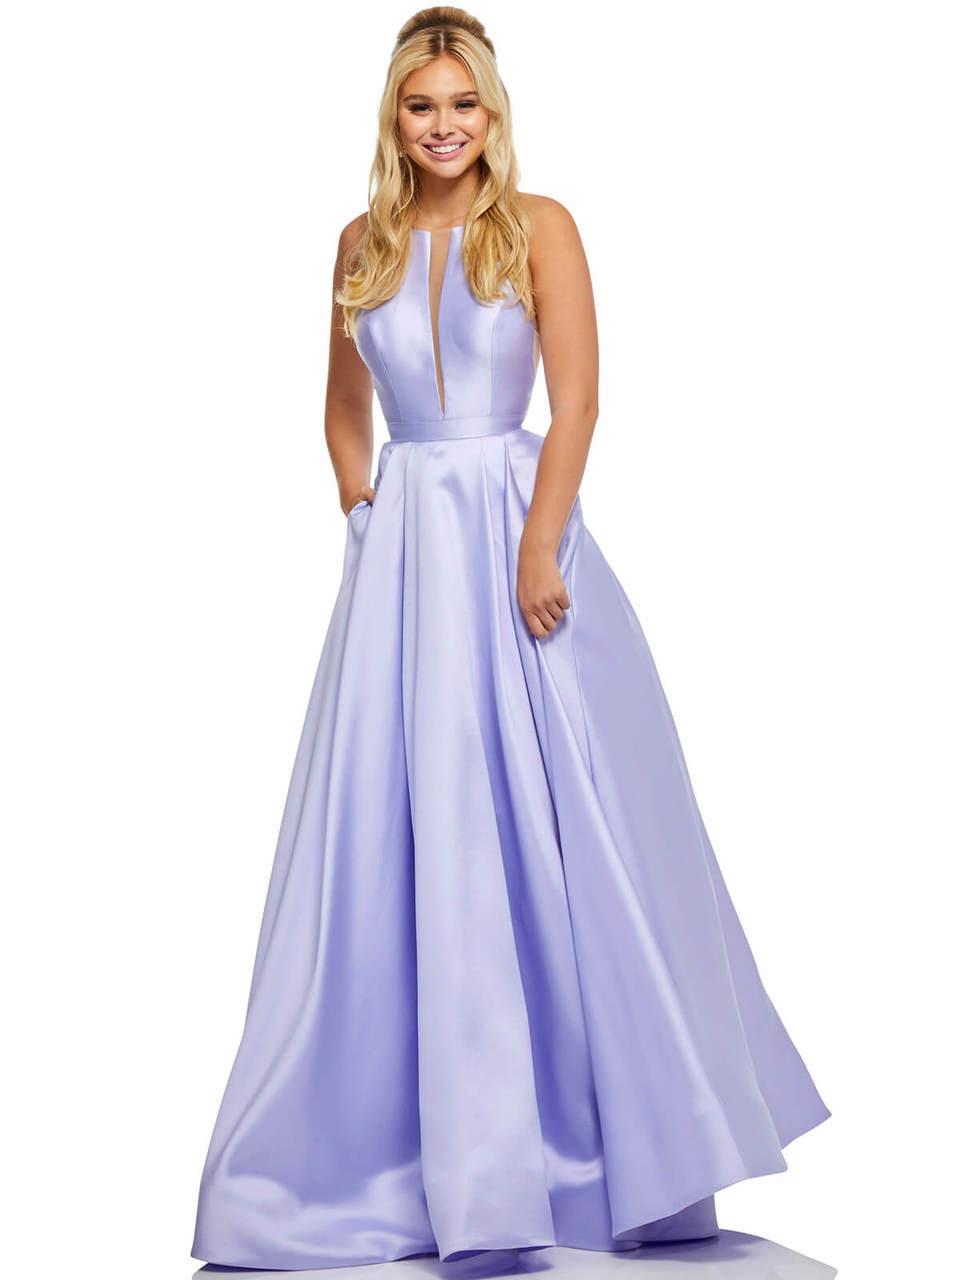 1c69ed1cc83 High Neckline A-line Sherri Hill Prom Dress 52583 - PromHeadquarters.com